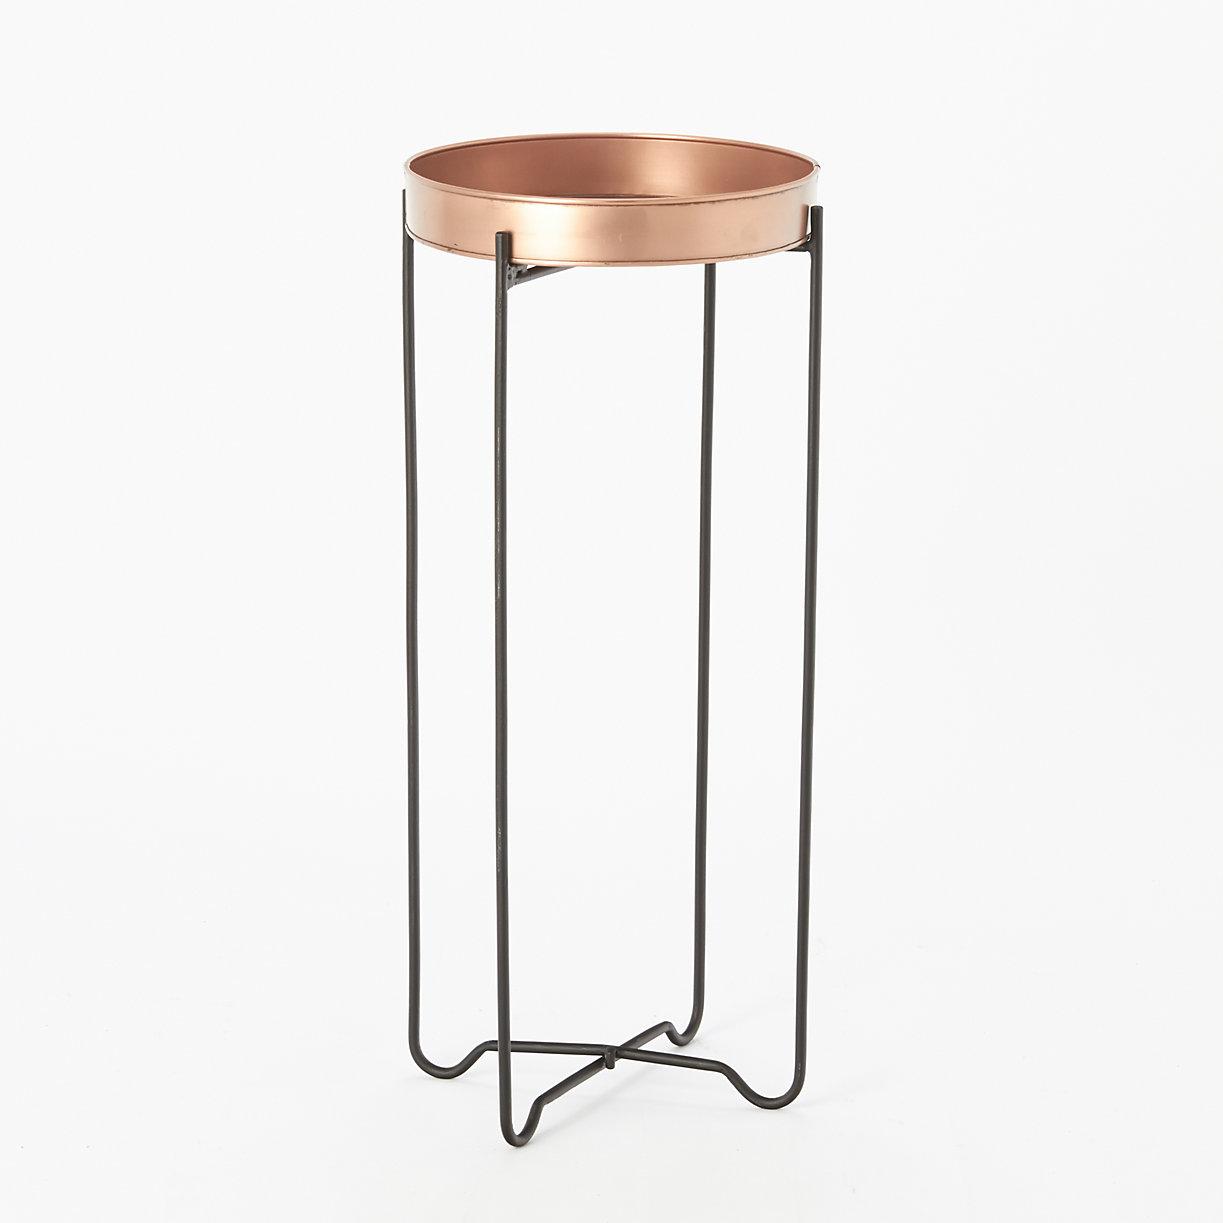 Copper Tray Table Tall Terrain